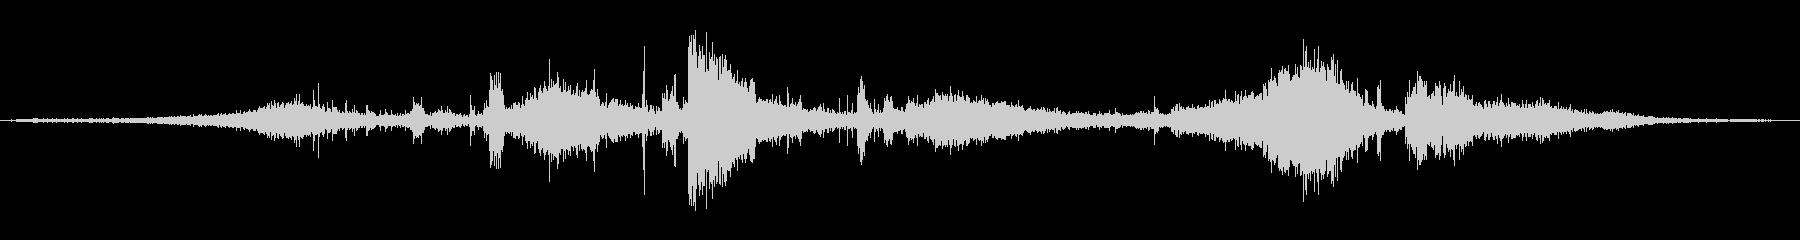 EXT:プルアップアンドバイ、スト...の未再生の波形